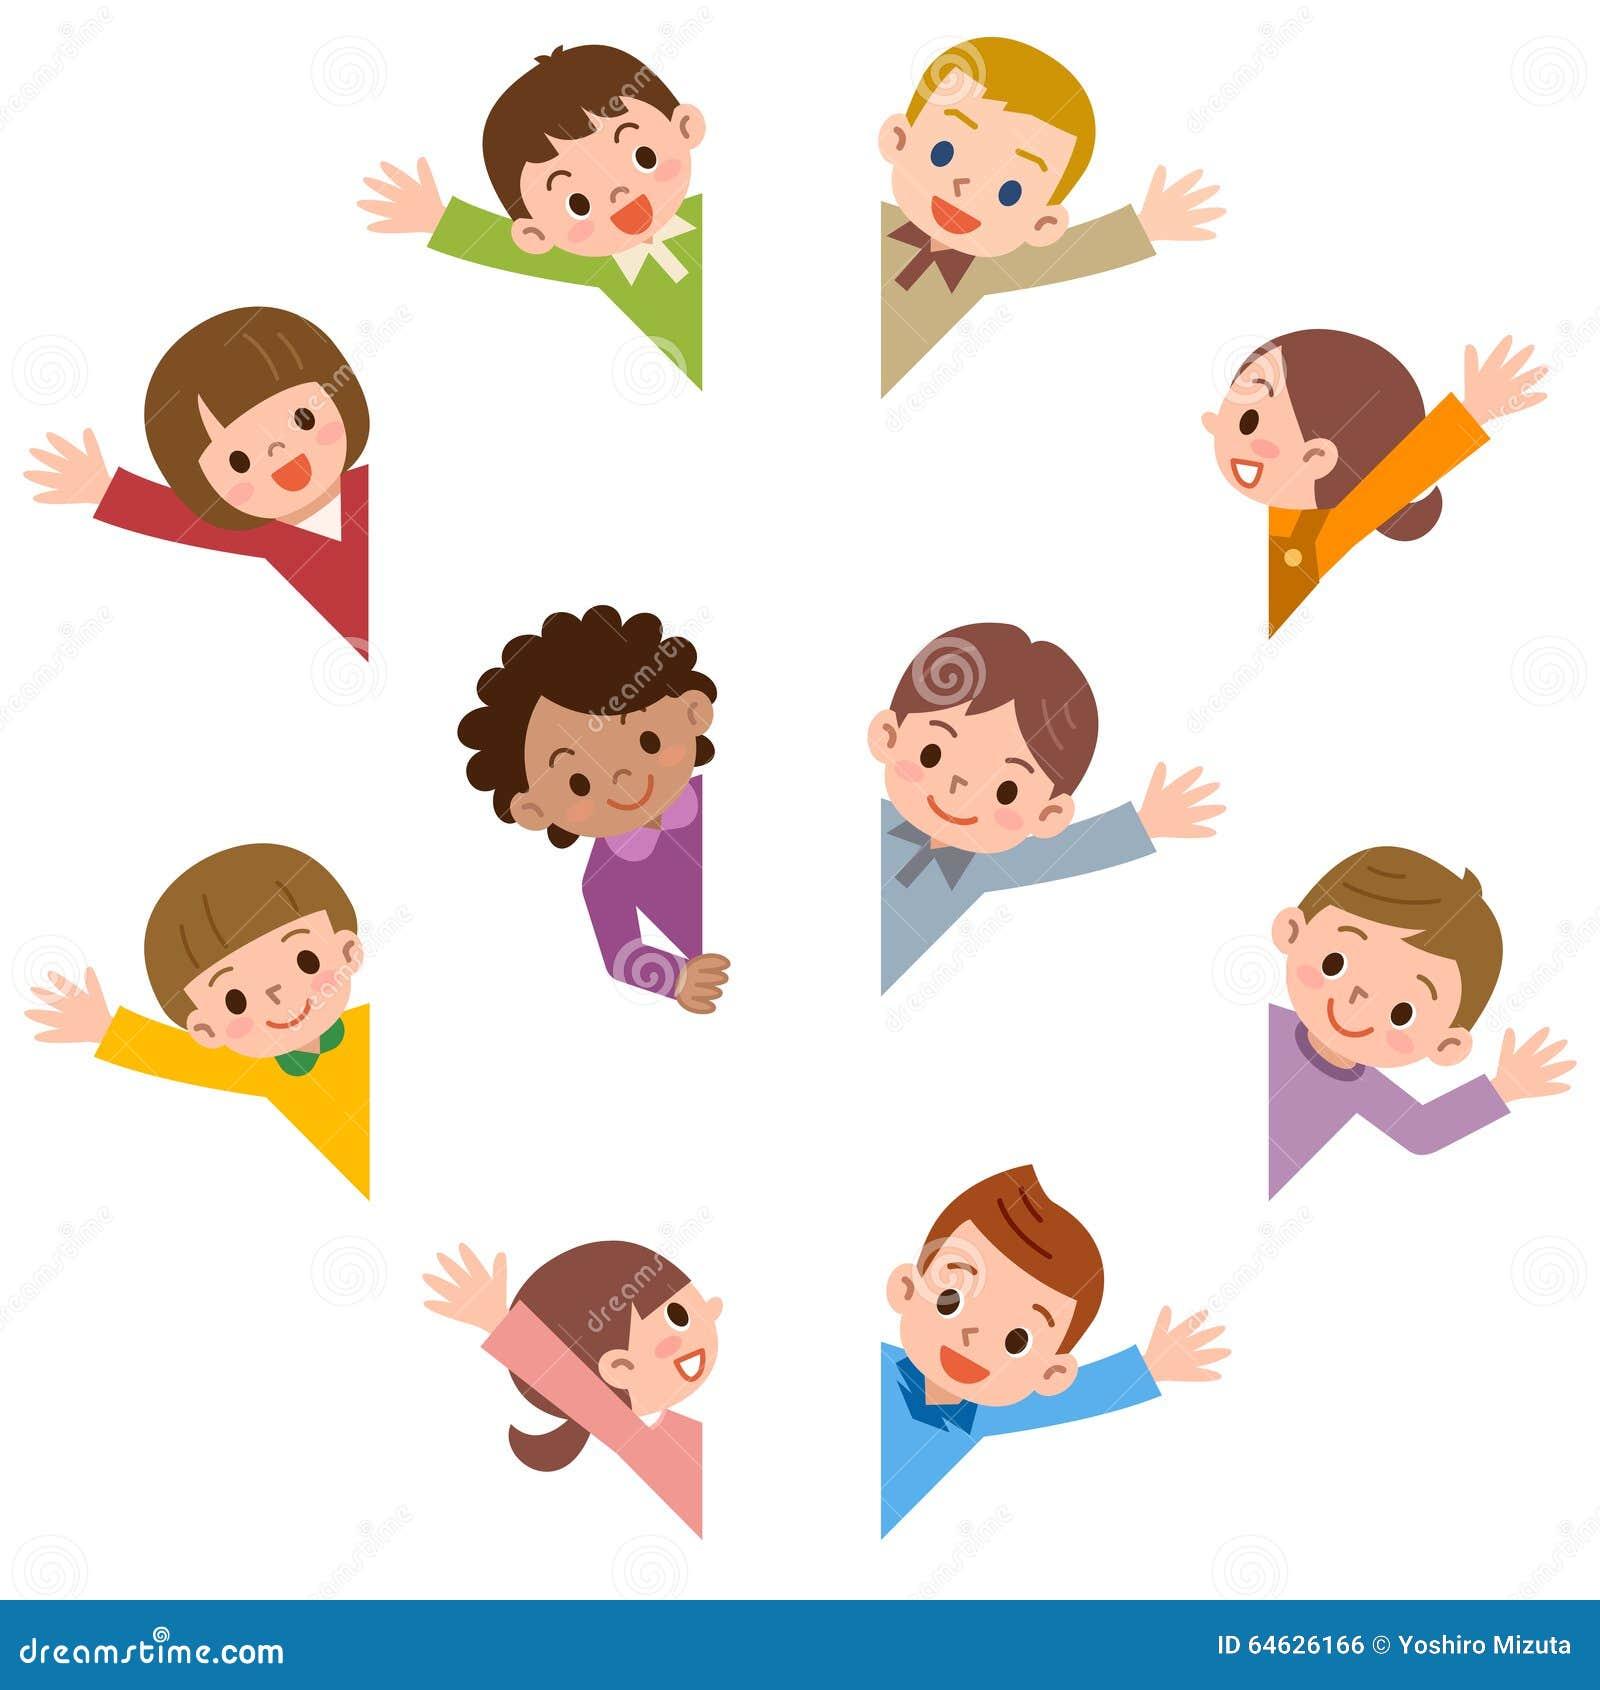 Children Smile Waving Stock Vector - Image: 64626166